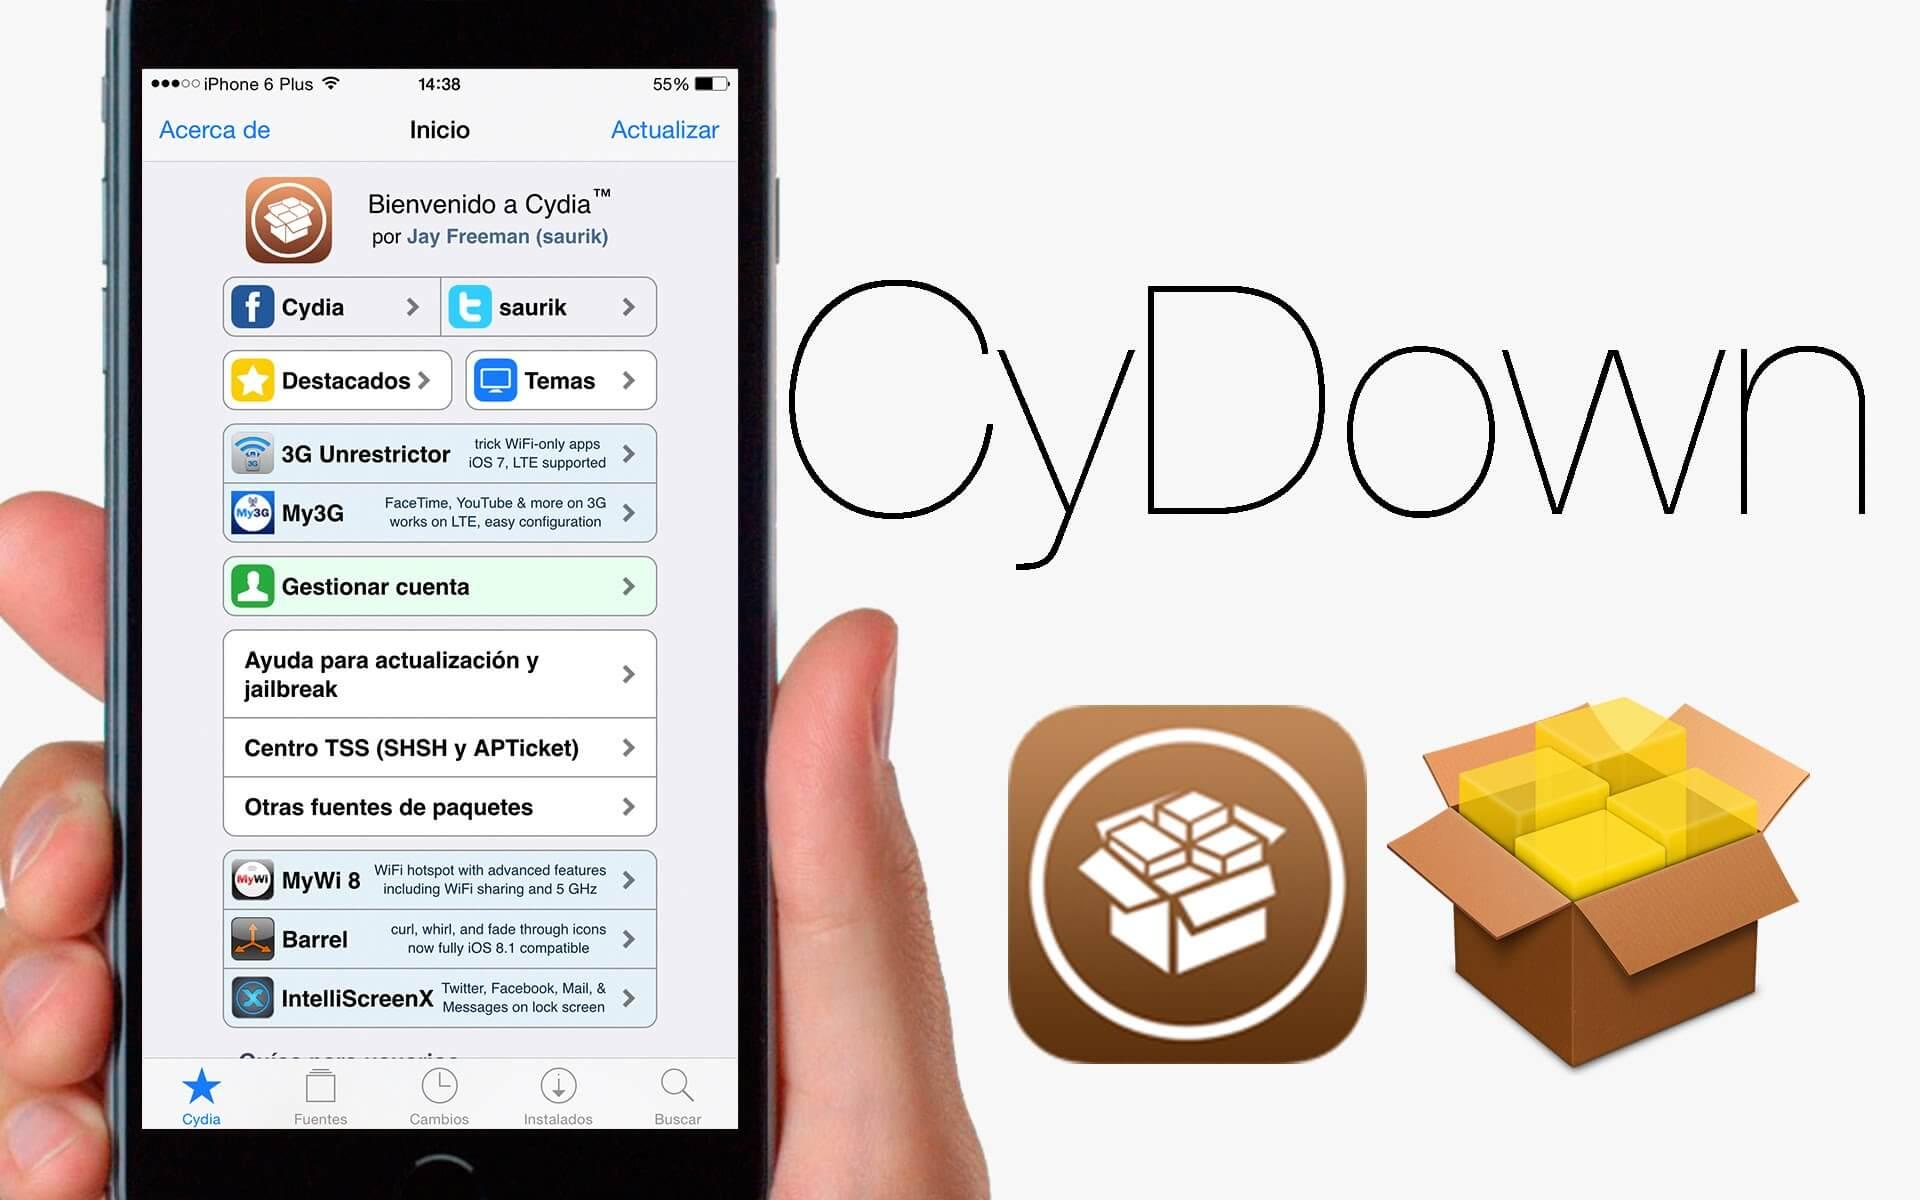 Descarga e instala tweaks de pago en Cydia totalmente gratis